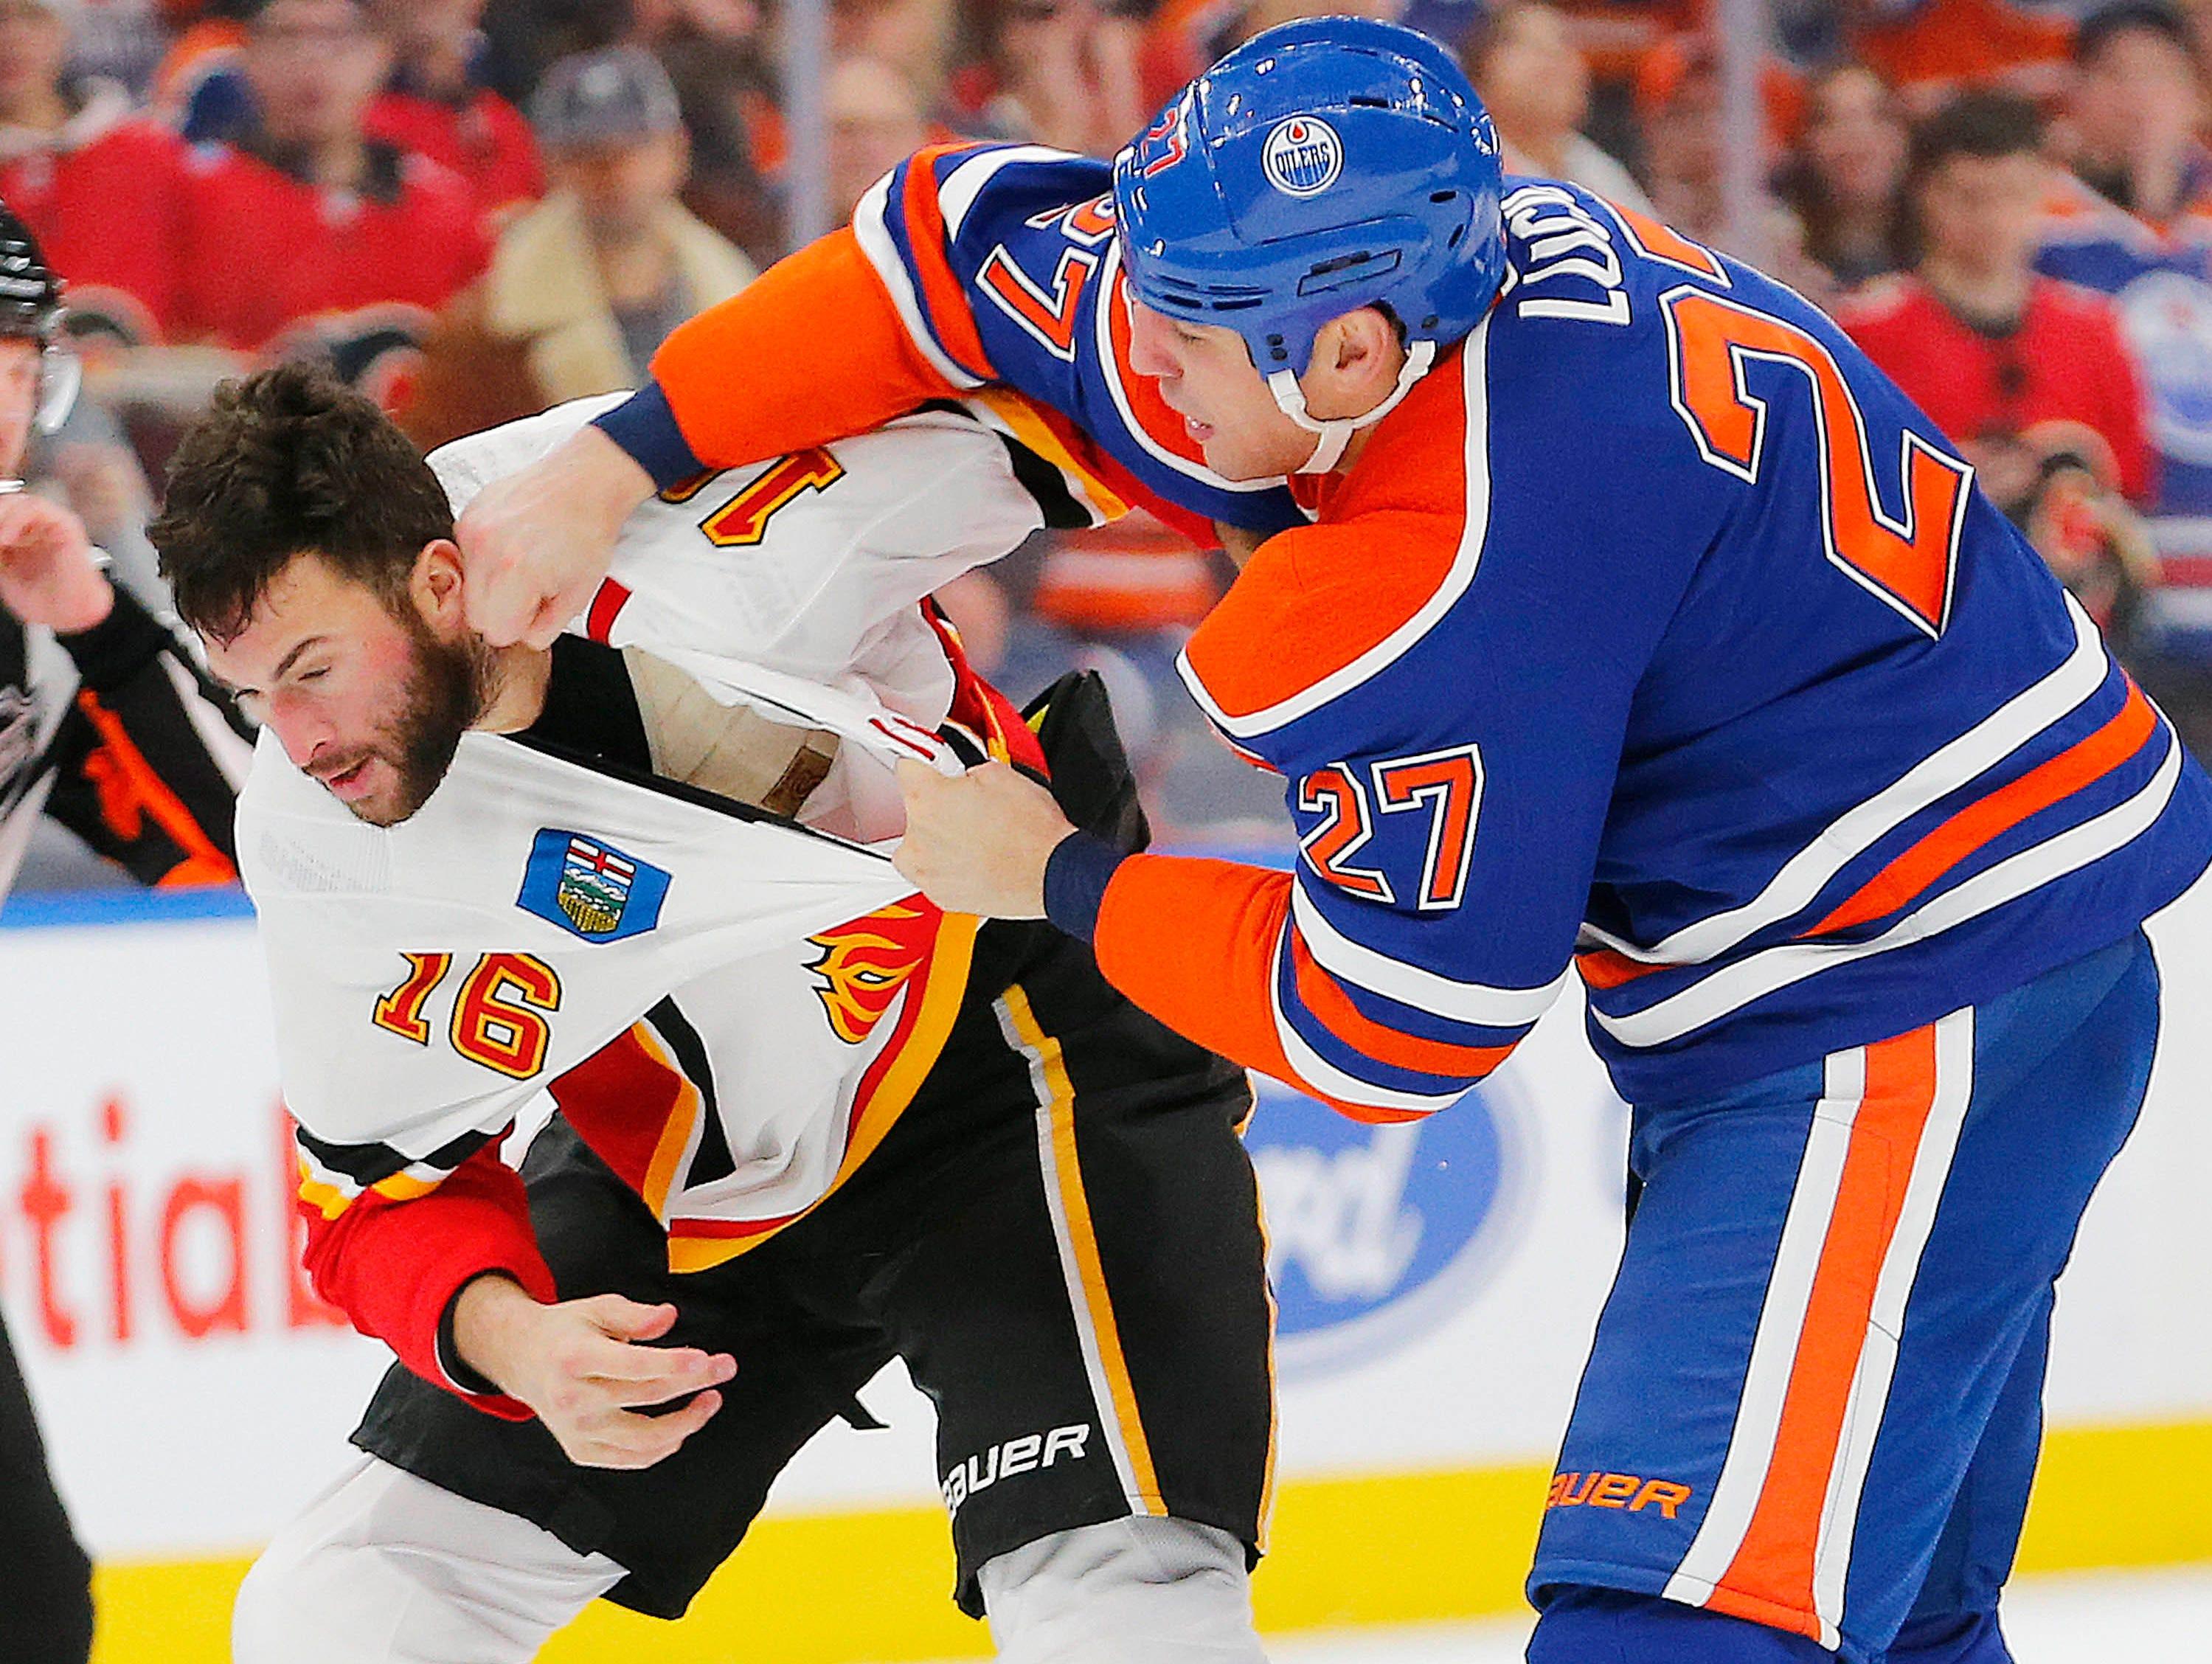 Dec. 9: Calgary Flames' Anthony Peluso vs. Edmonton Oilers' Milan Lucic.